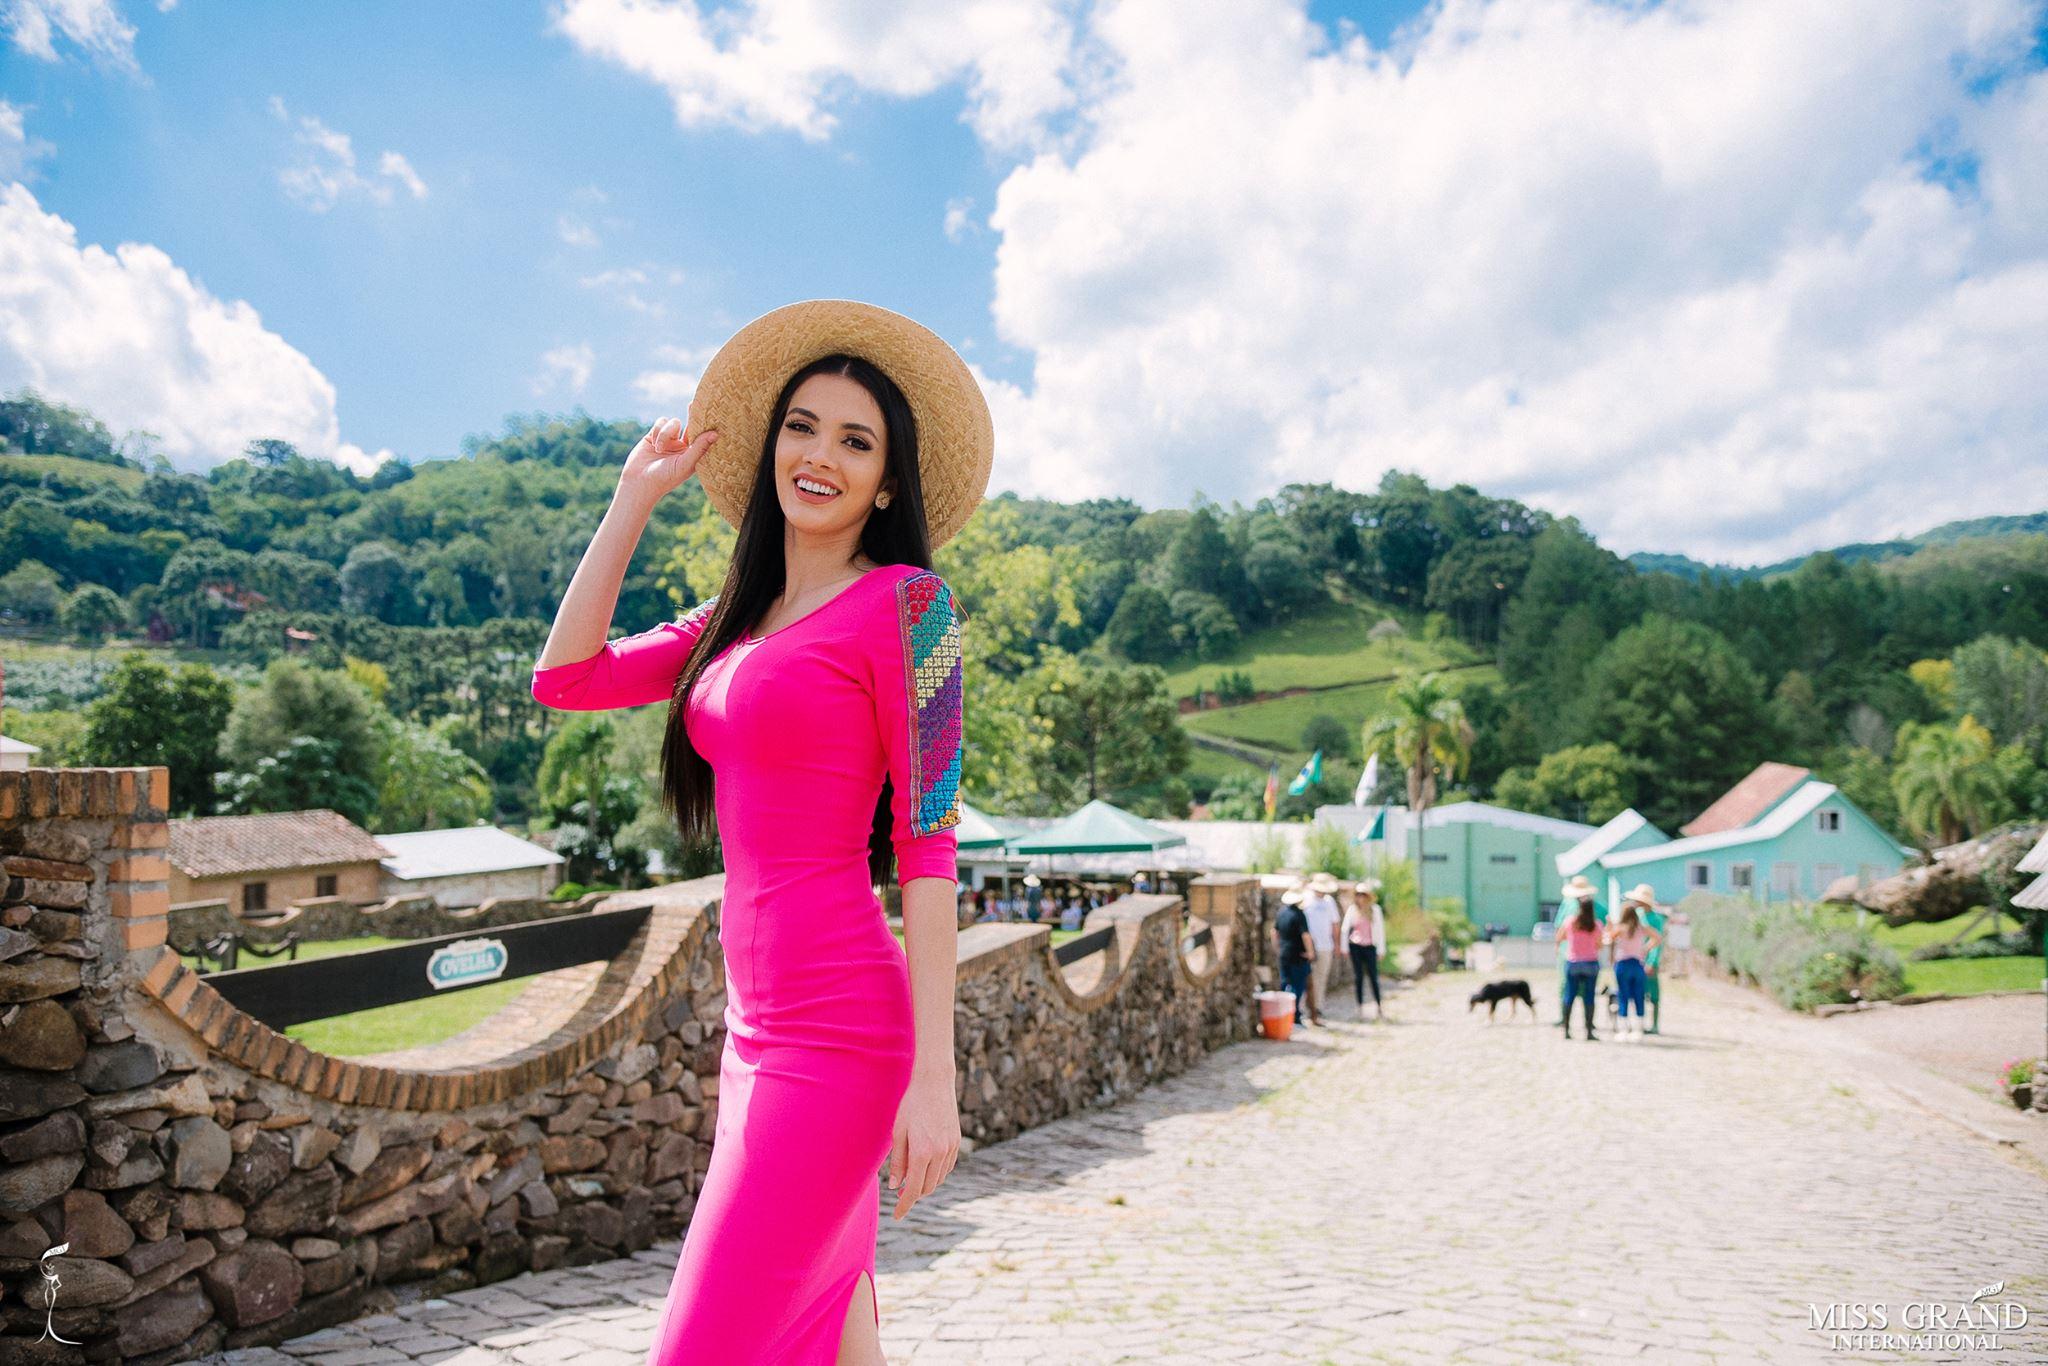 miss grand international 2018 visitando brasil para assistir a final de miss grand brasil 2019. - Página 3 Gx9foi8l